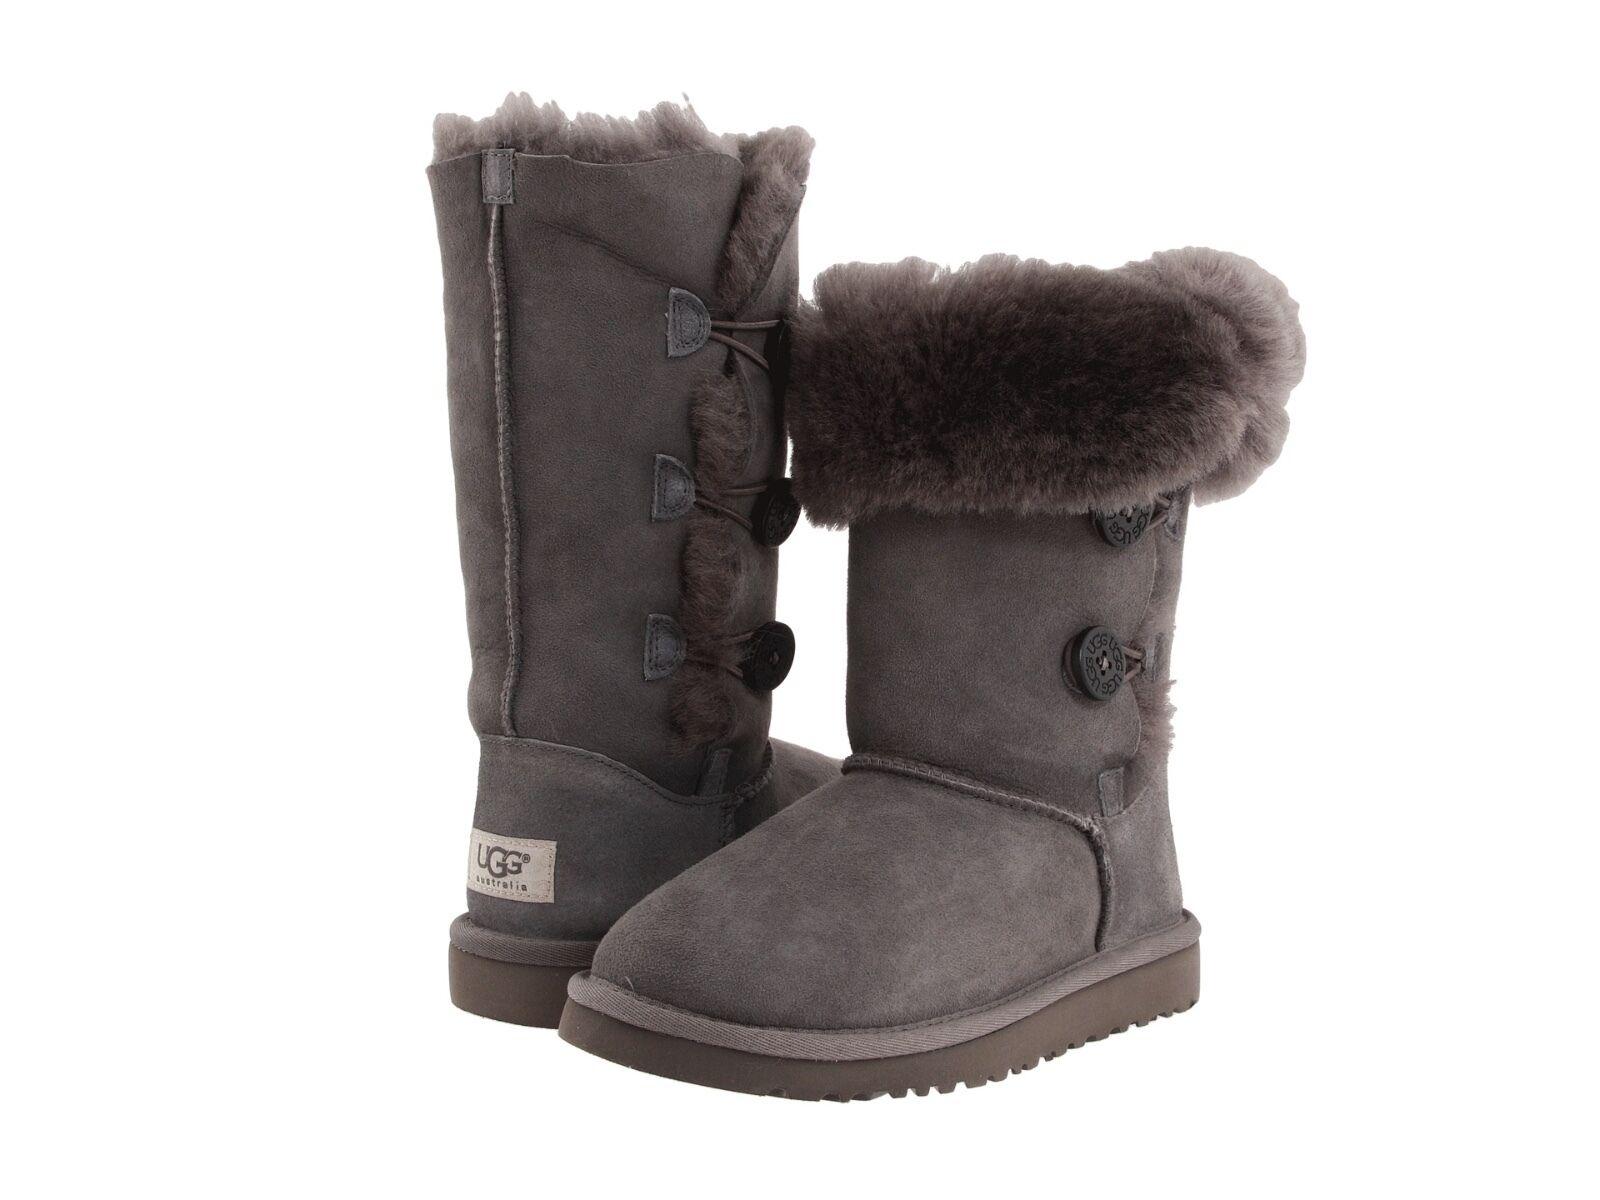 ugg australia bailey button triplet 6 m grey leather boots 1873 ebay